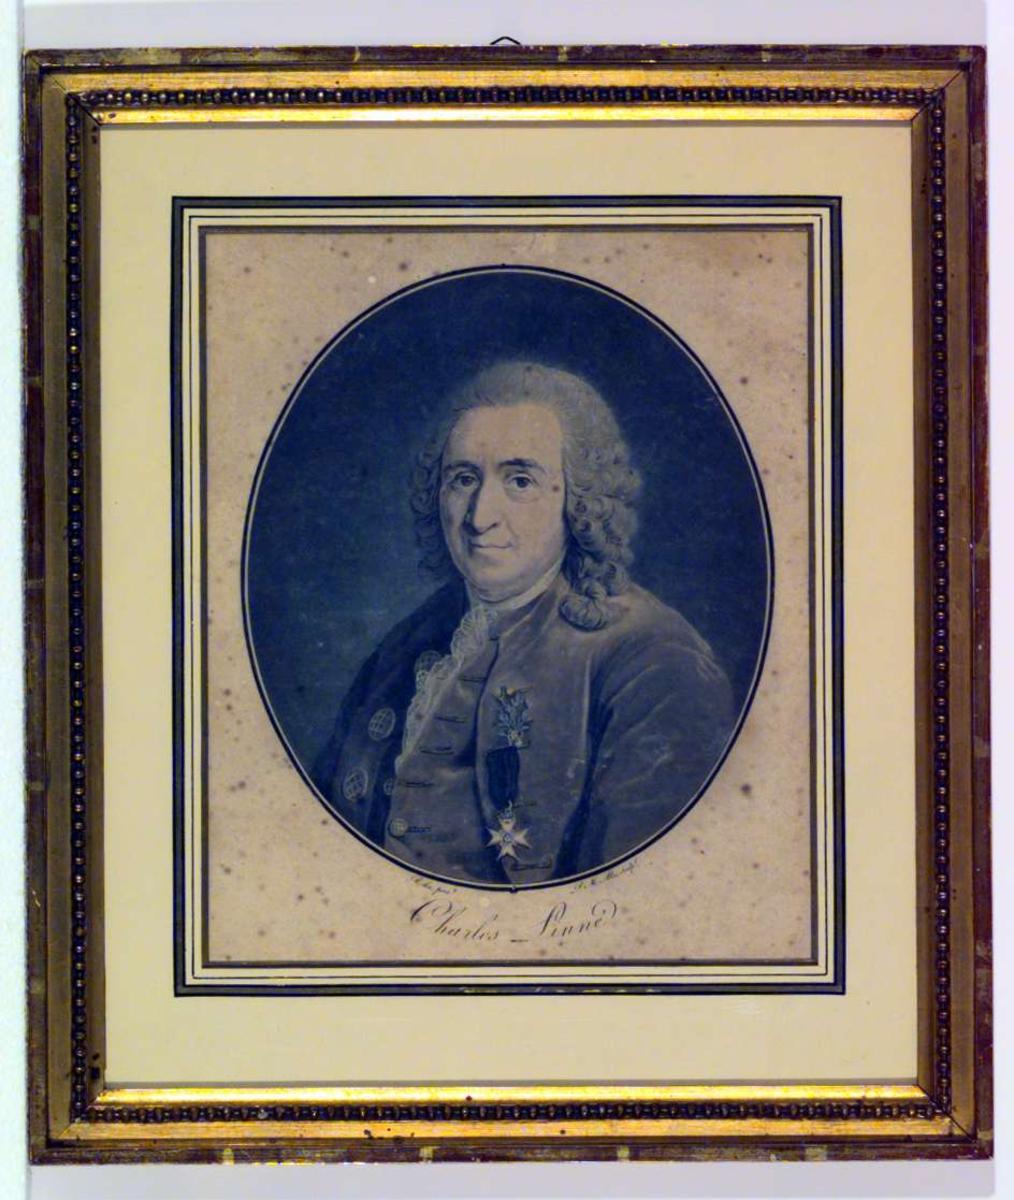 Portrett av Carl von Linné.